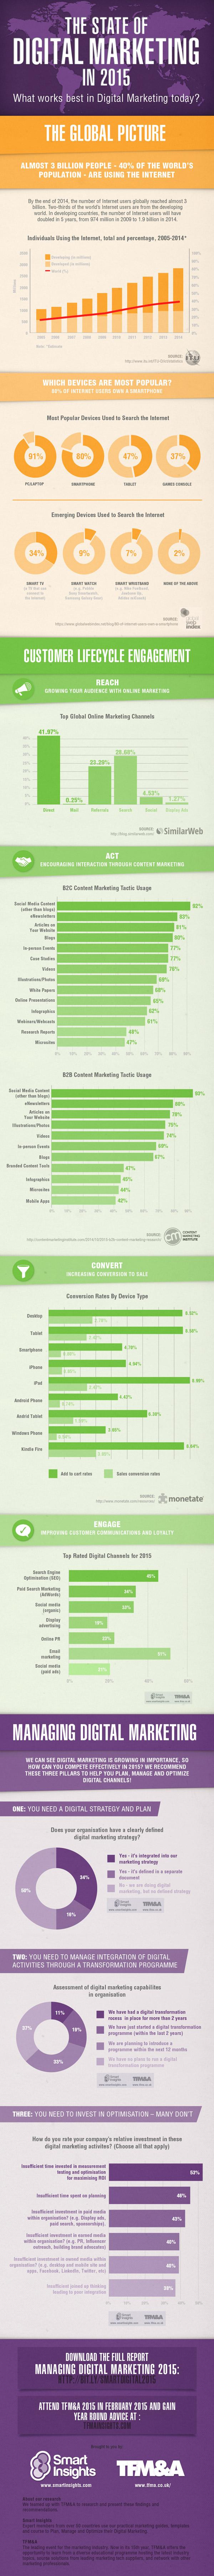 stateofdigital-marketing-2015-infographic